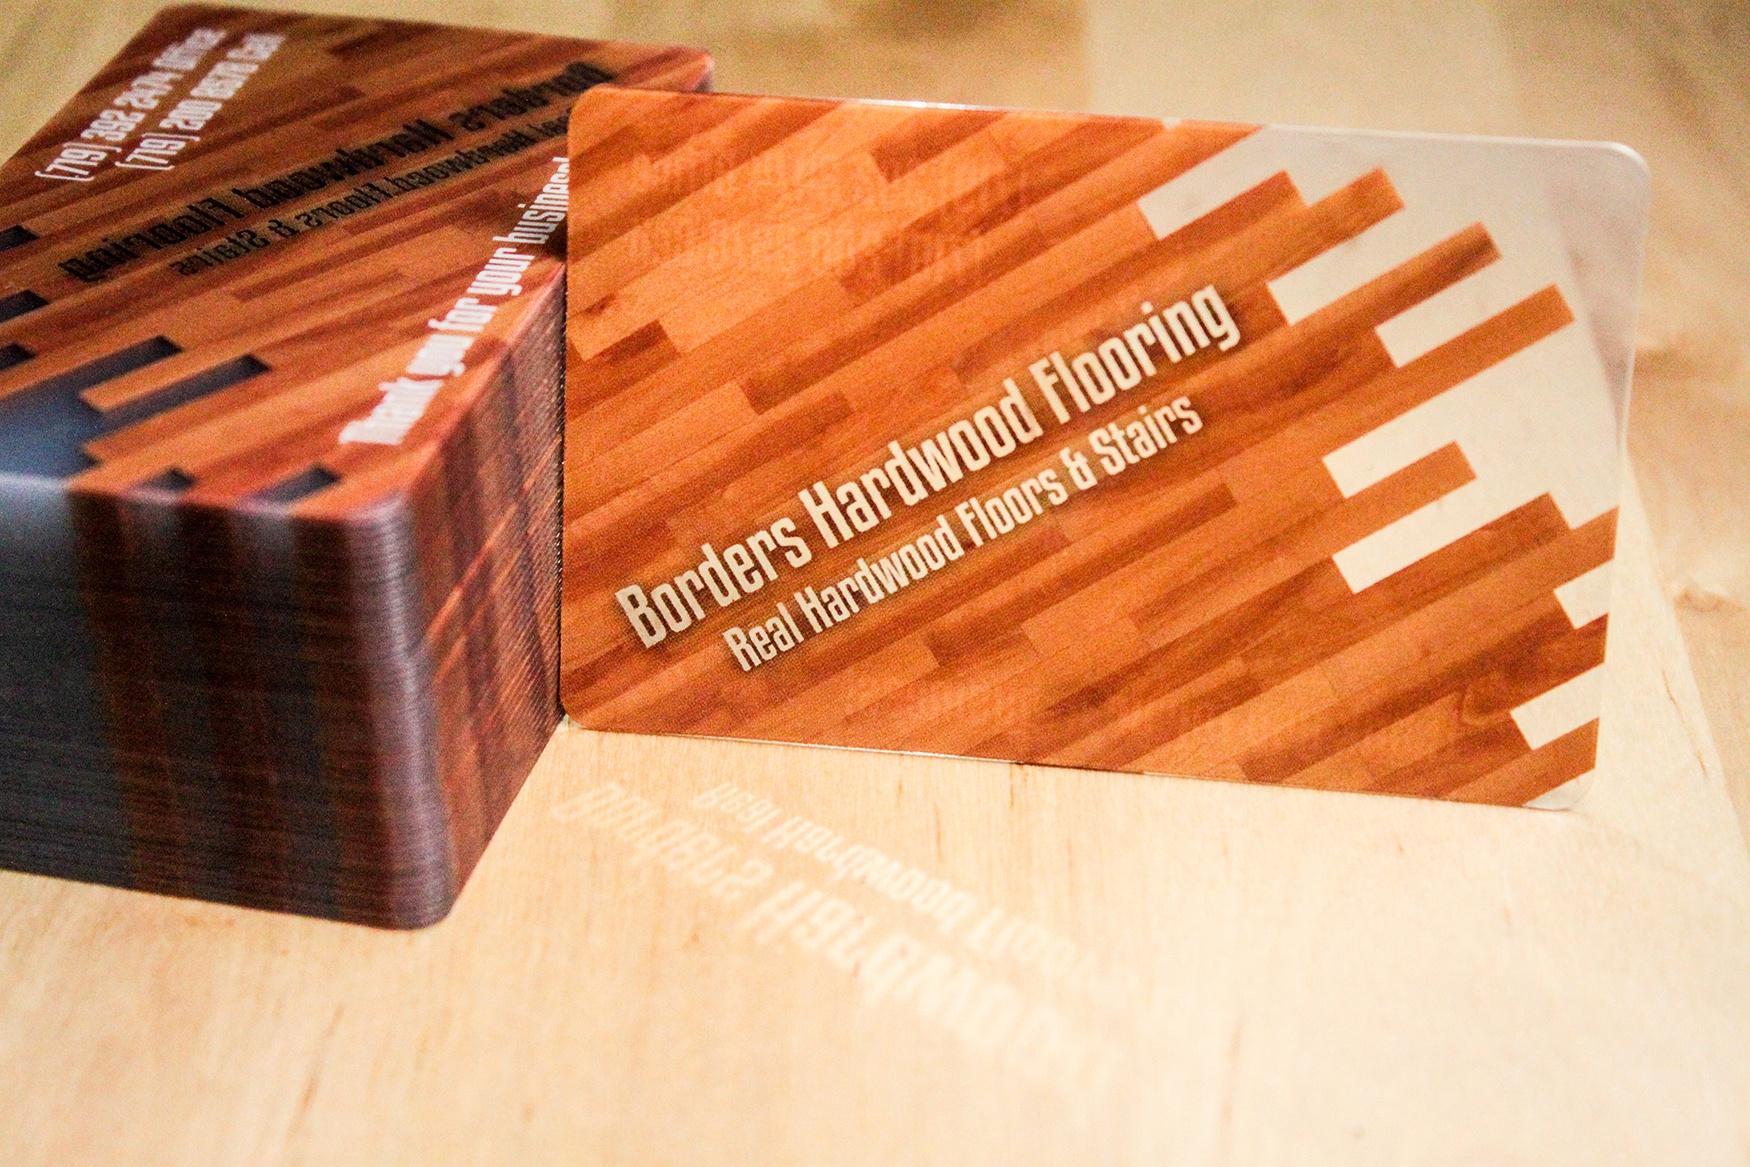 Hardwood flooring business cards borders hardwood flooring business cards colourmoves